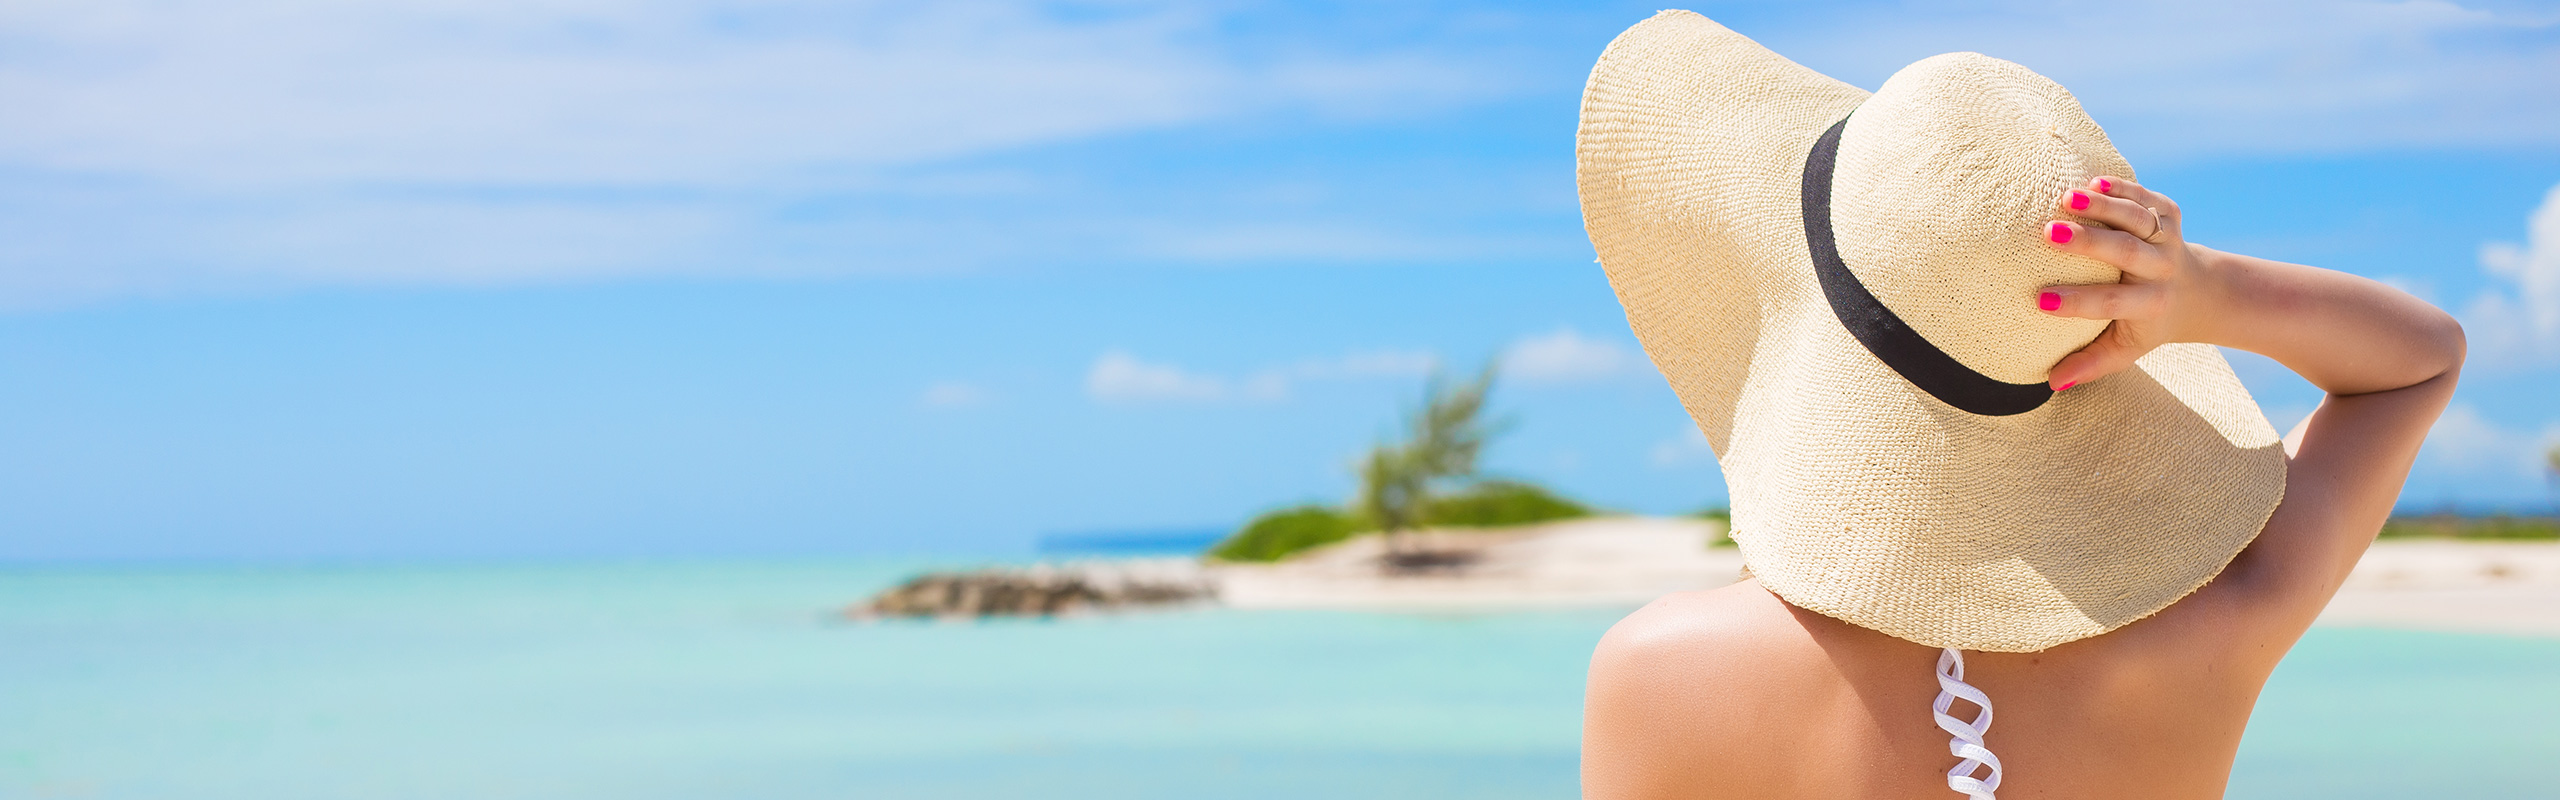 Skin Cancer Specialists - Melbourne Dermatology